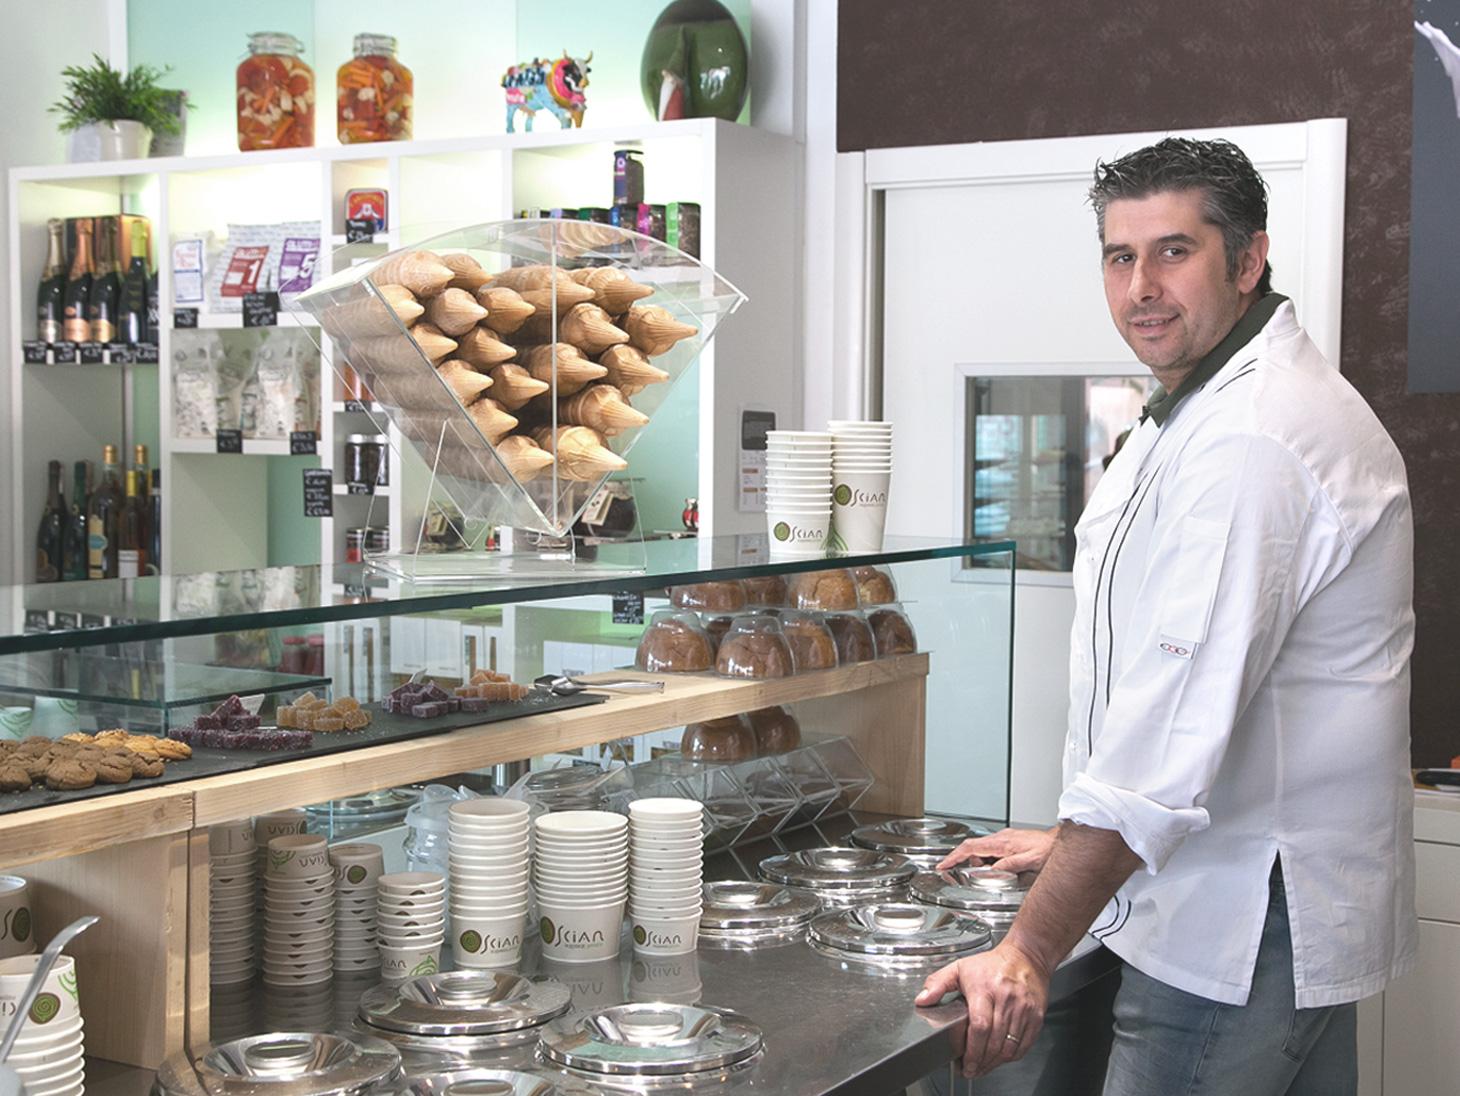 The Ice Cream Shop of Alessandro Scian